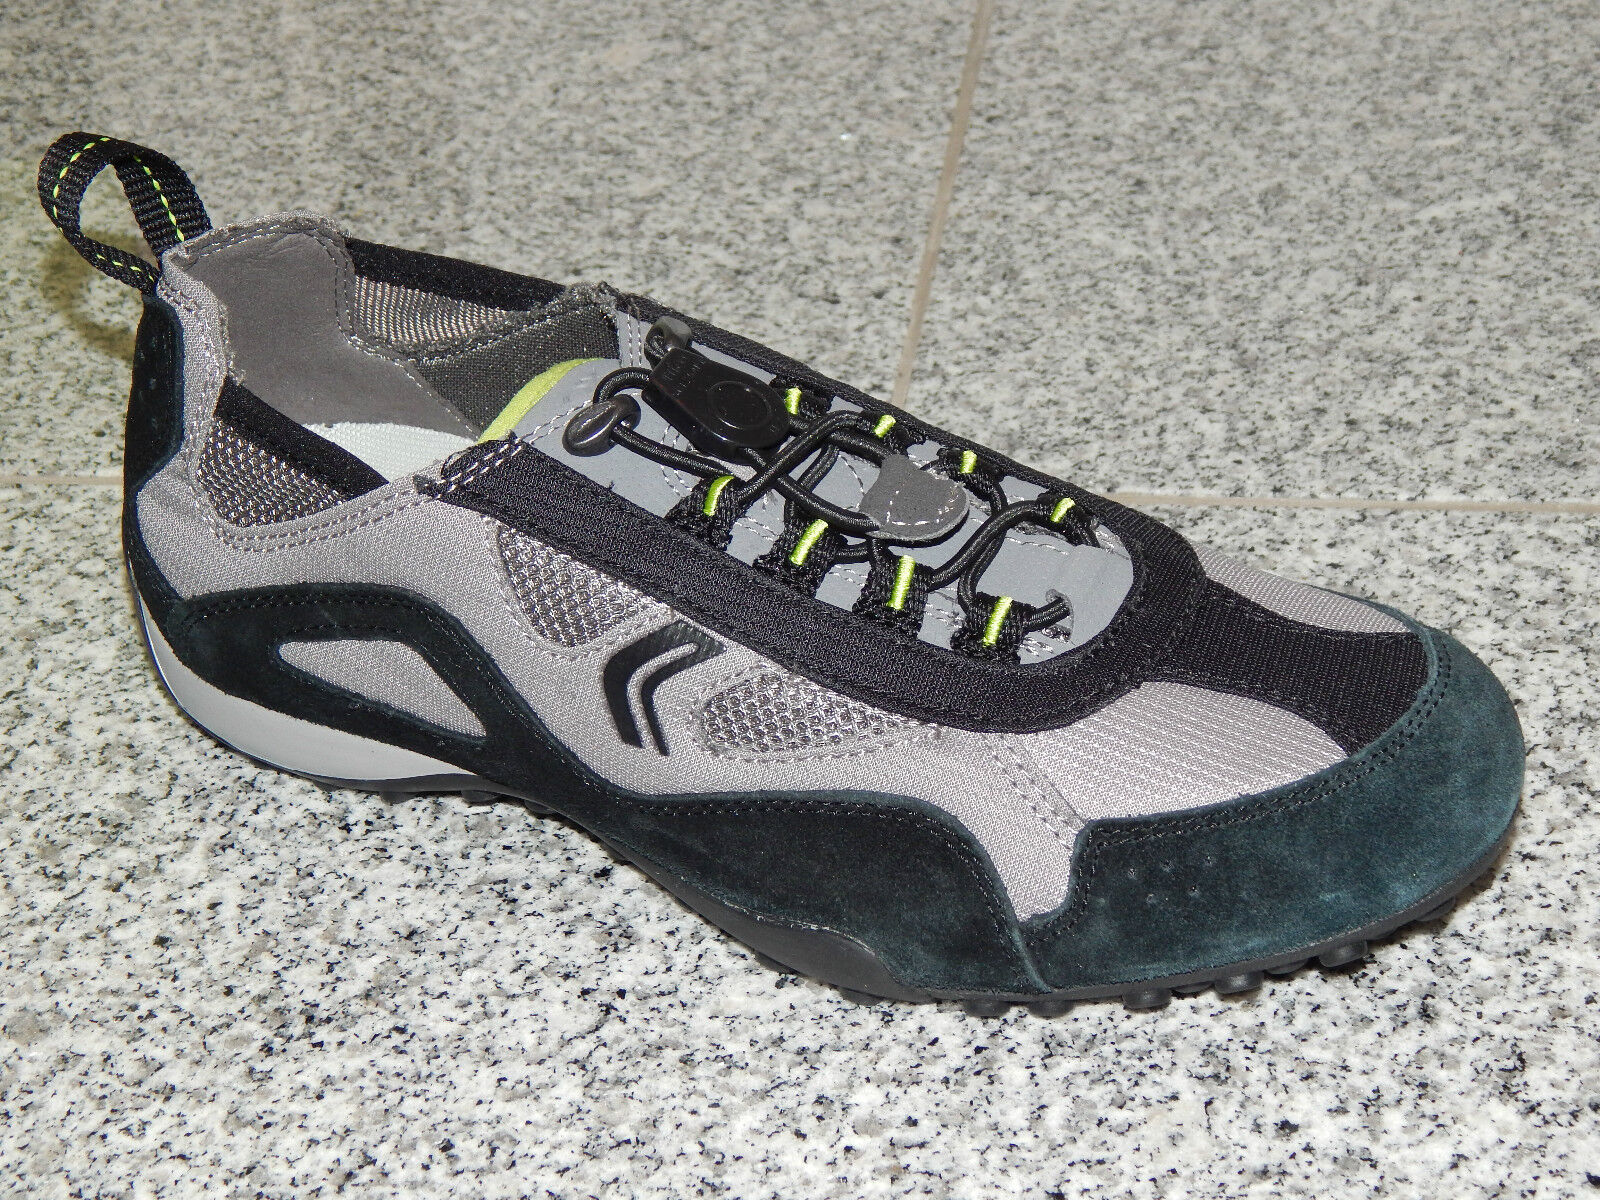 Geox Respira Snake Schuhe  Leder Herren Sneaker 41 42 43 44 45 46  47 Neu